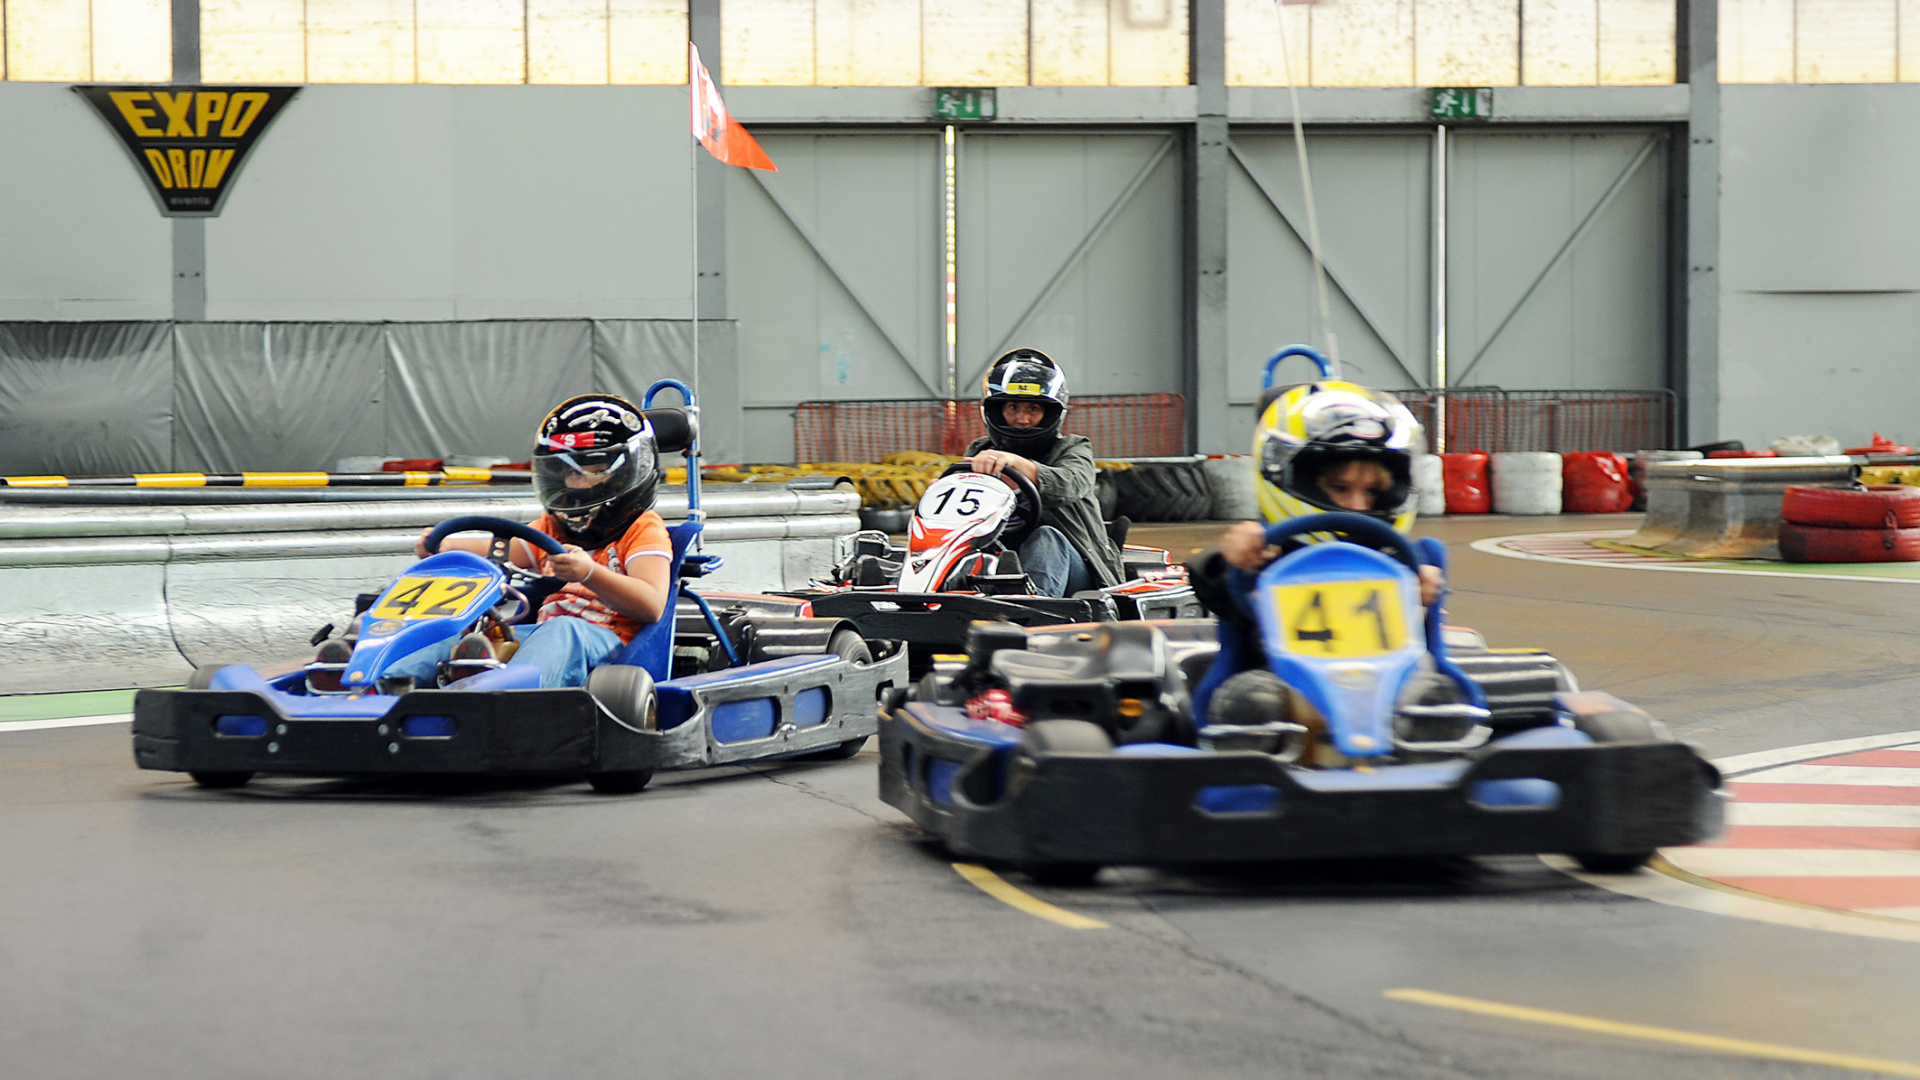 bern kart Expodrom Indoor Karting   Bern Tourism bern kart